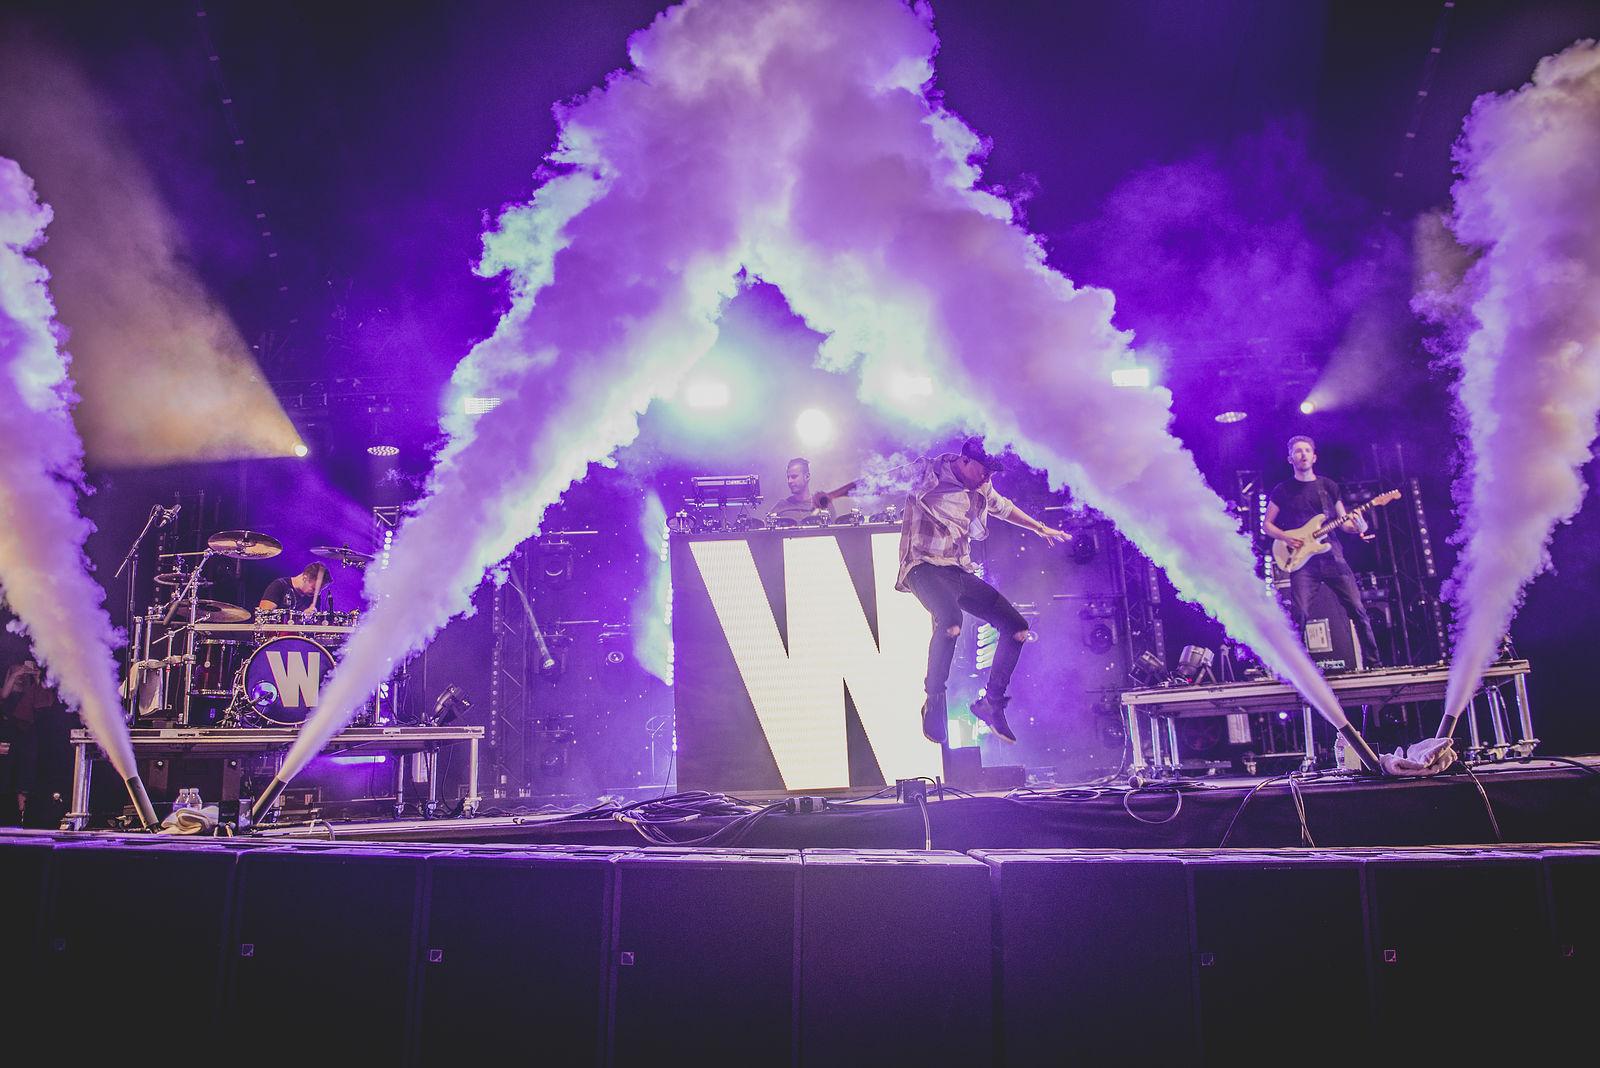 Wilkinson Live